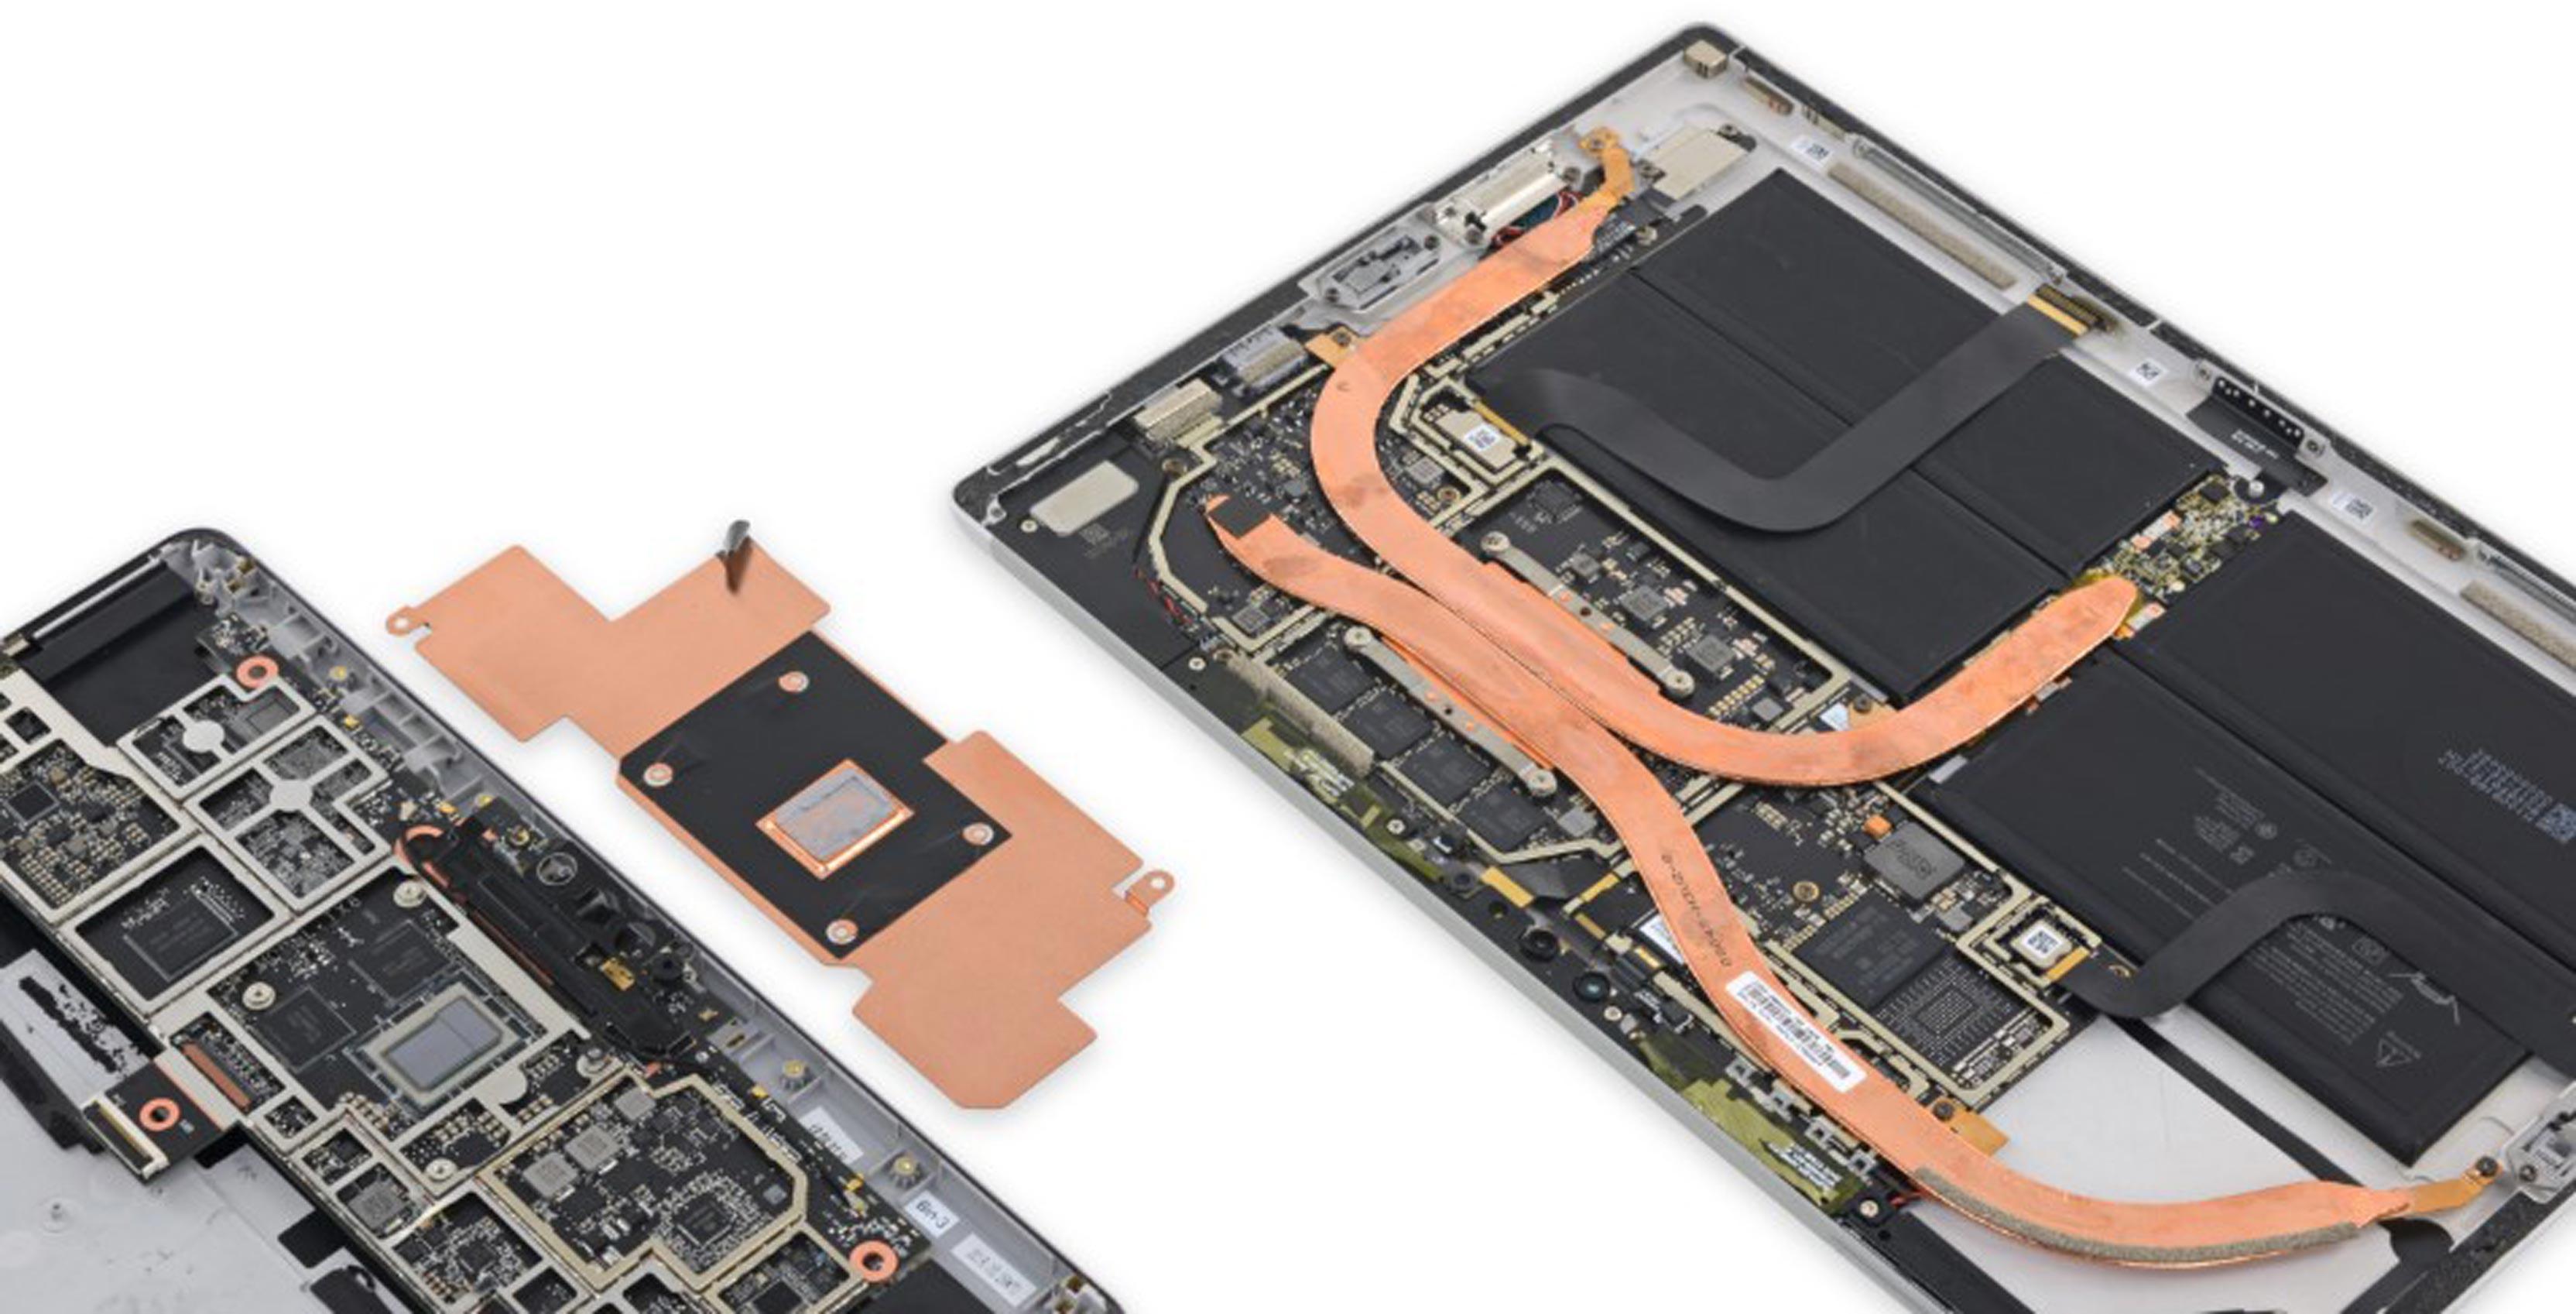 Surface Go's copper heat shield